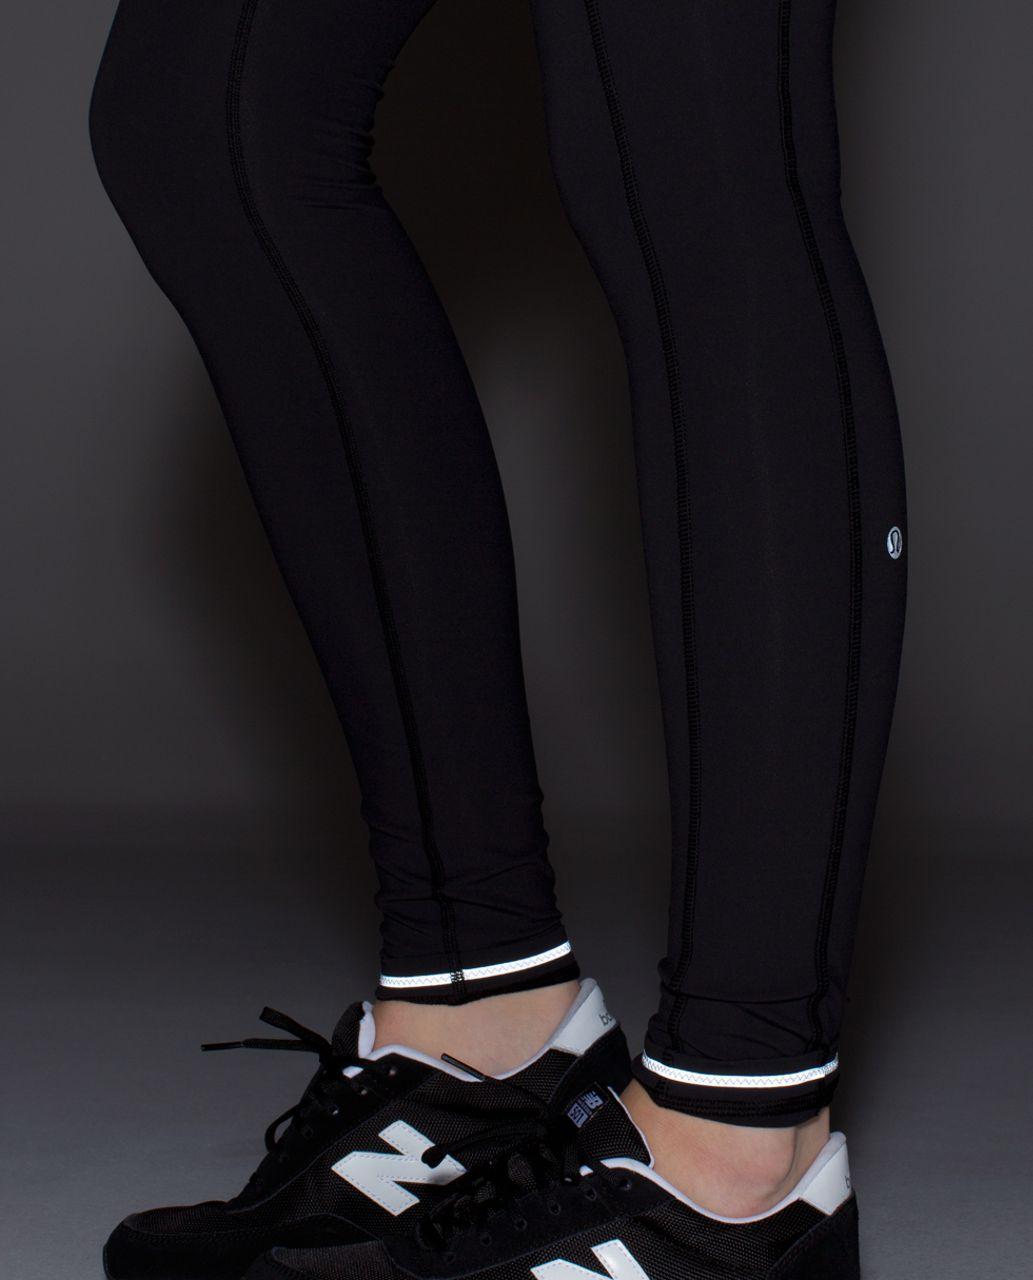 Lululemon Speed Tight II (Brushed) - Black / Dottie Dream Rose Neutral Blush Black